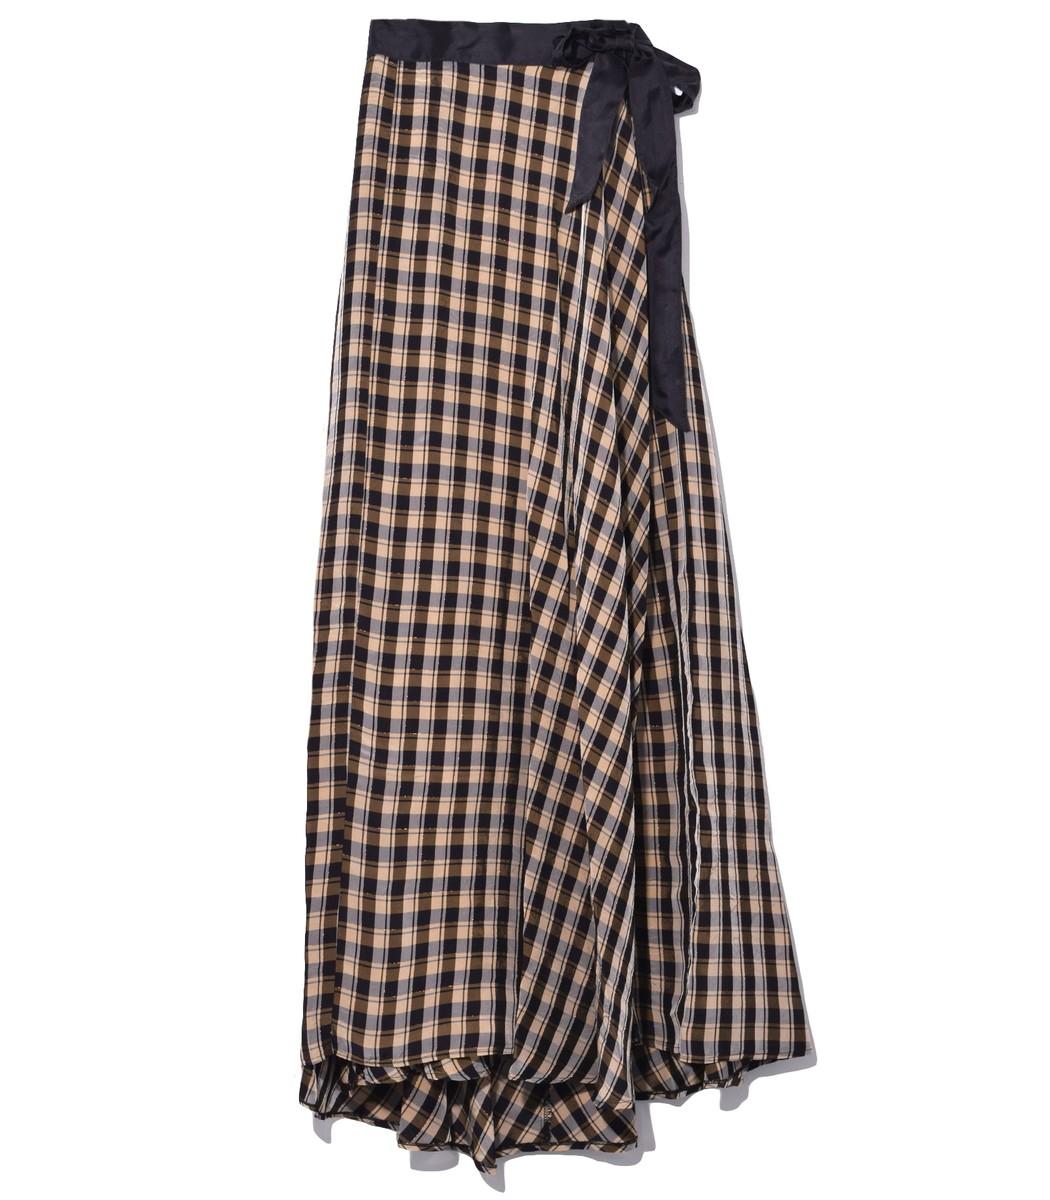 Nero Multicolor Viscose Tartan Long Skirt